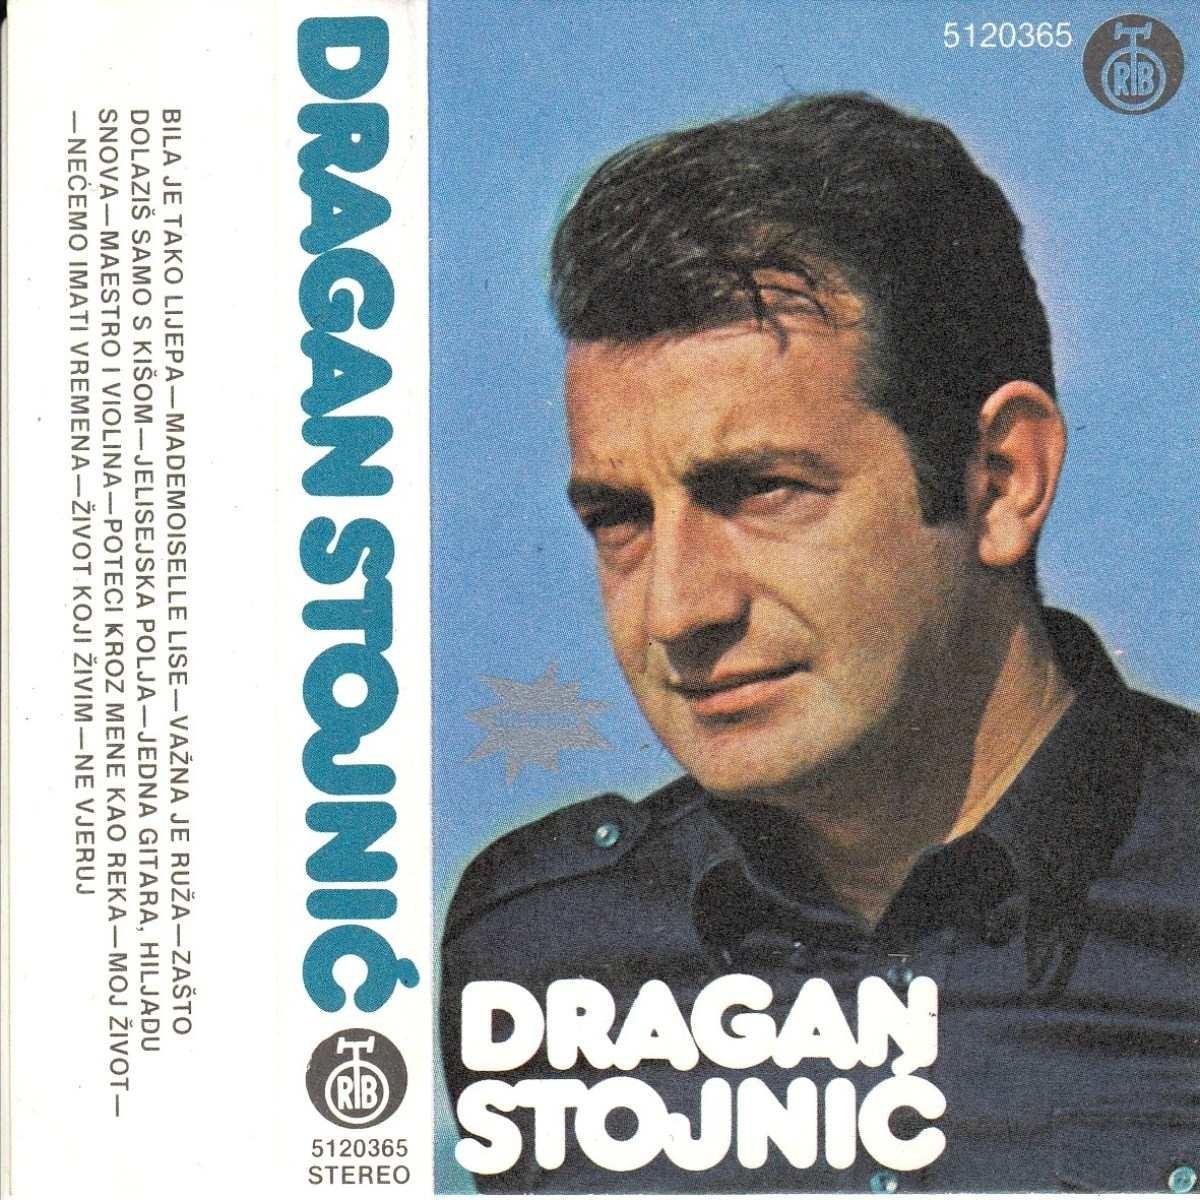 Stojnić Dragan - Dragan Stojnić - Bila Je Tako Lijepa